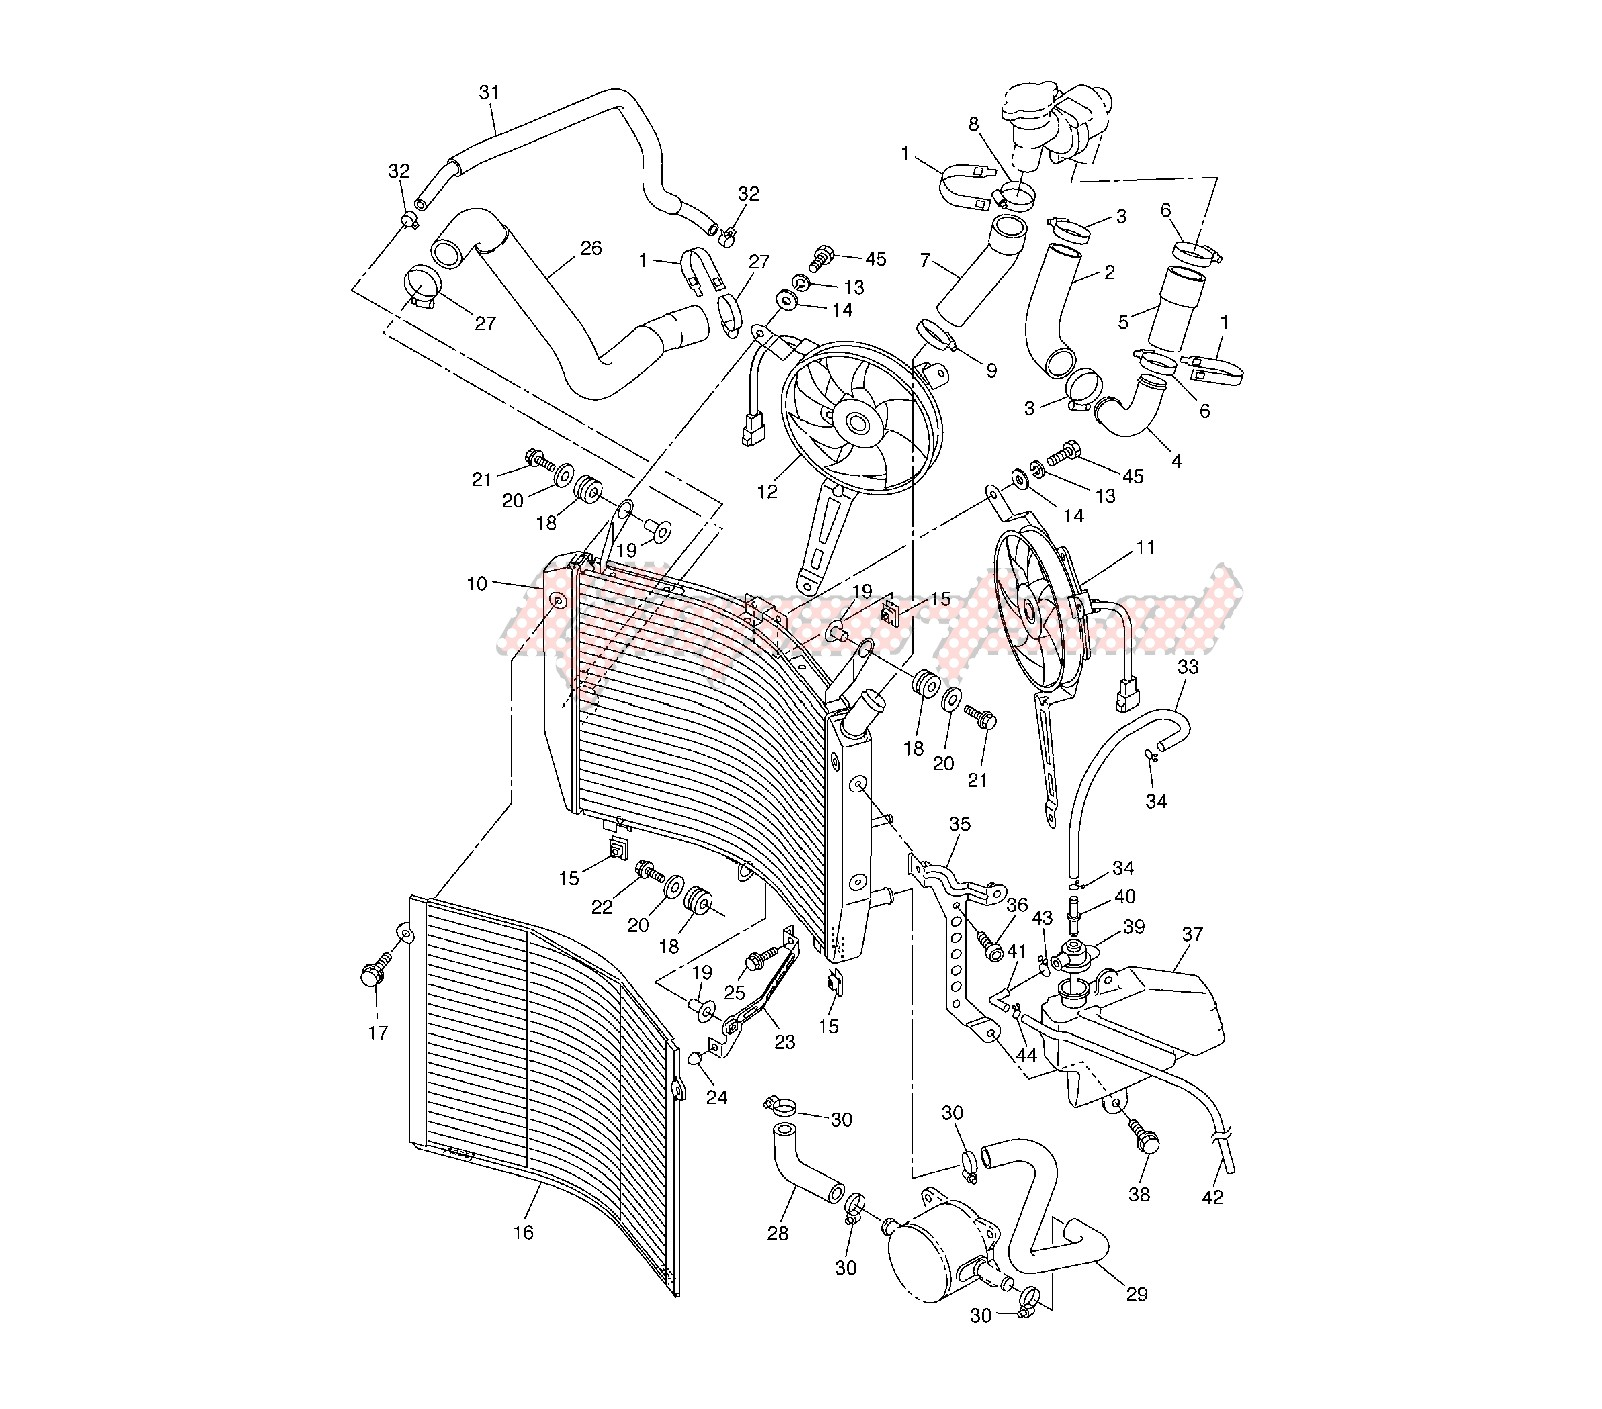 COOLING SYSTEM blueprint